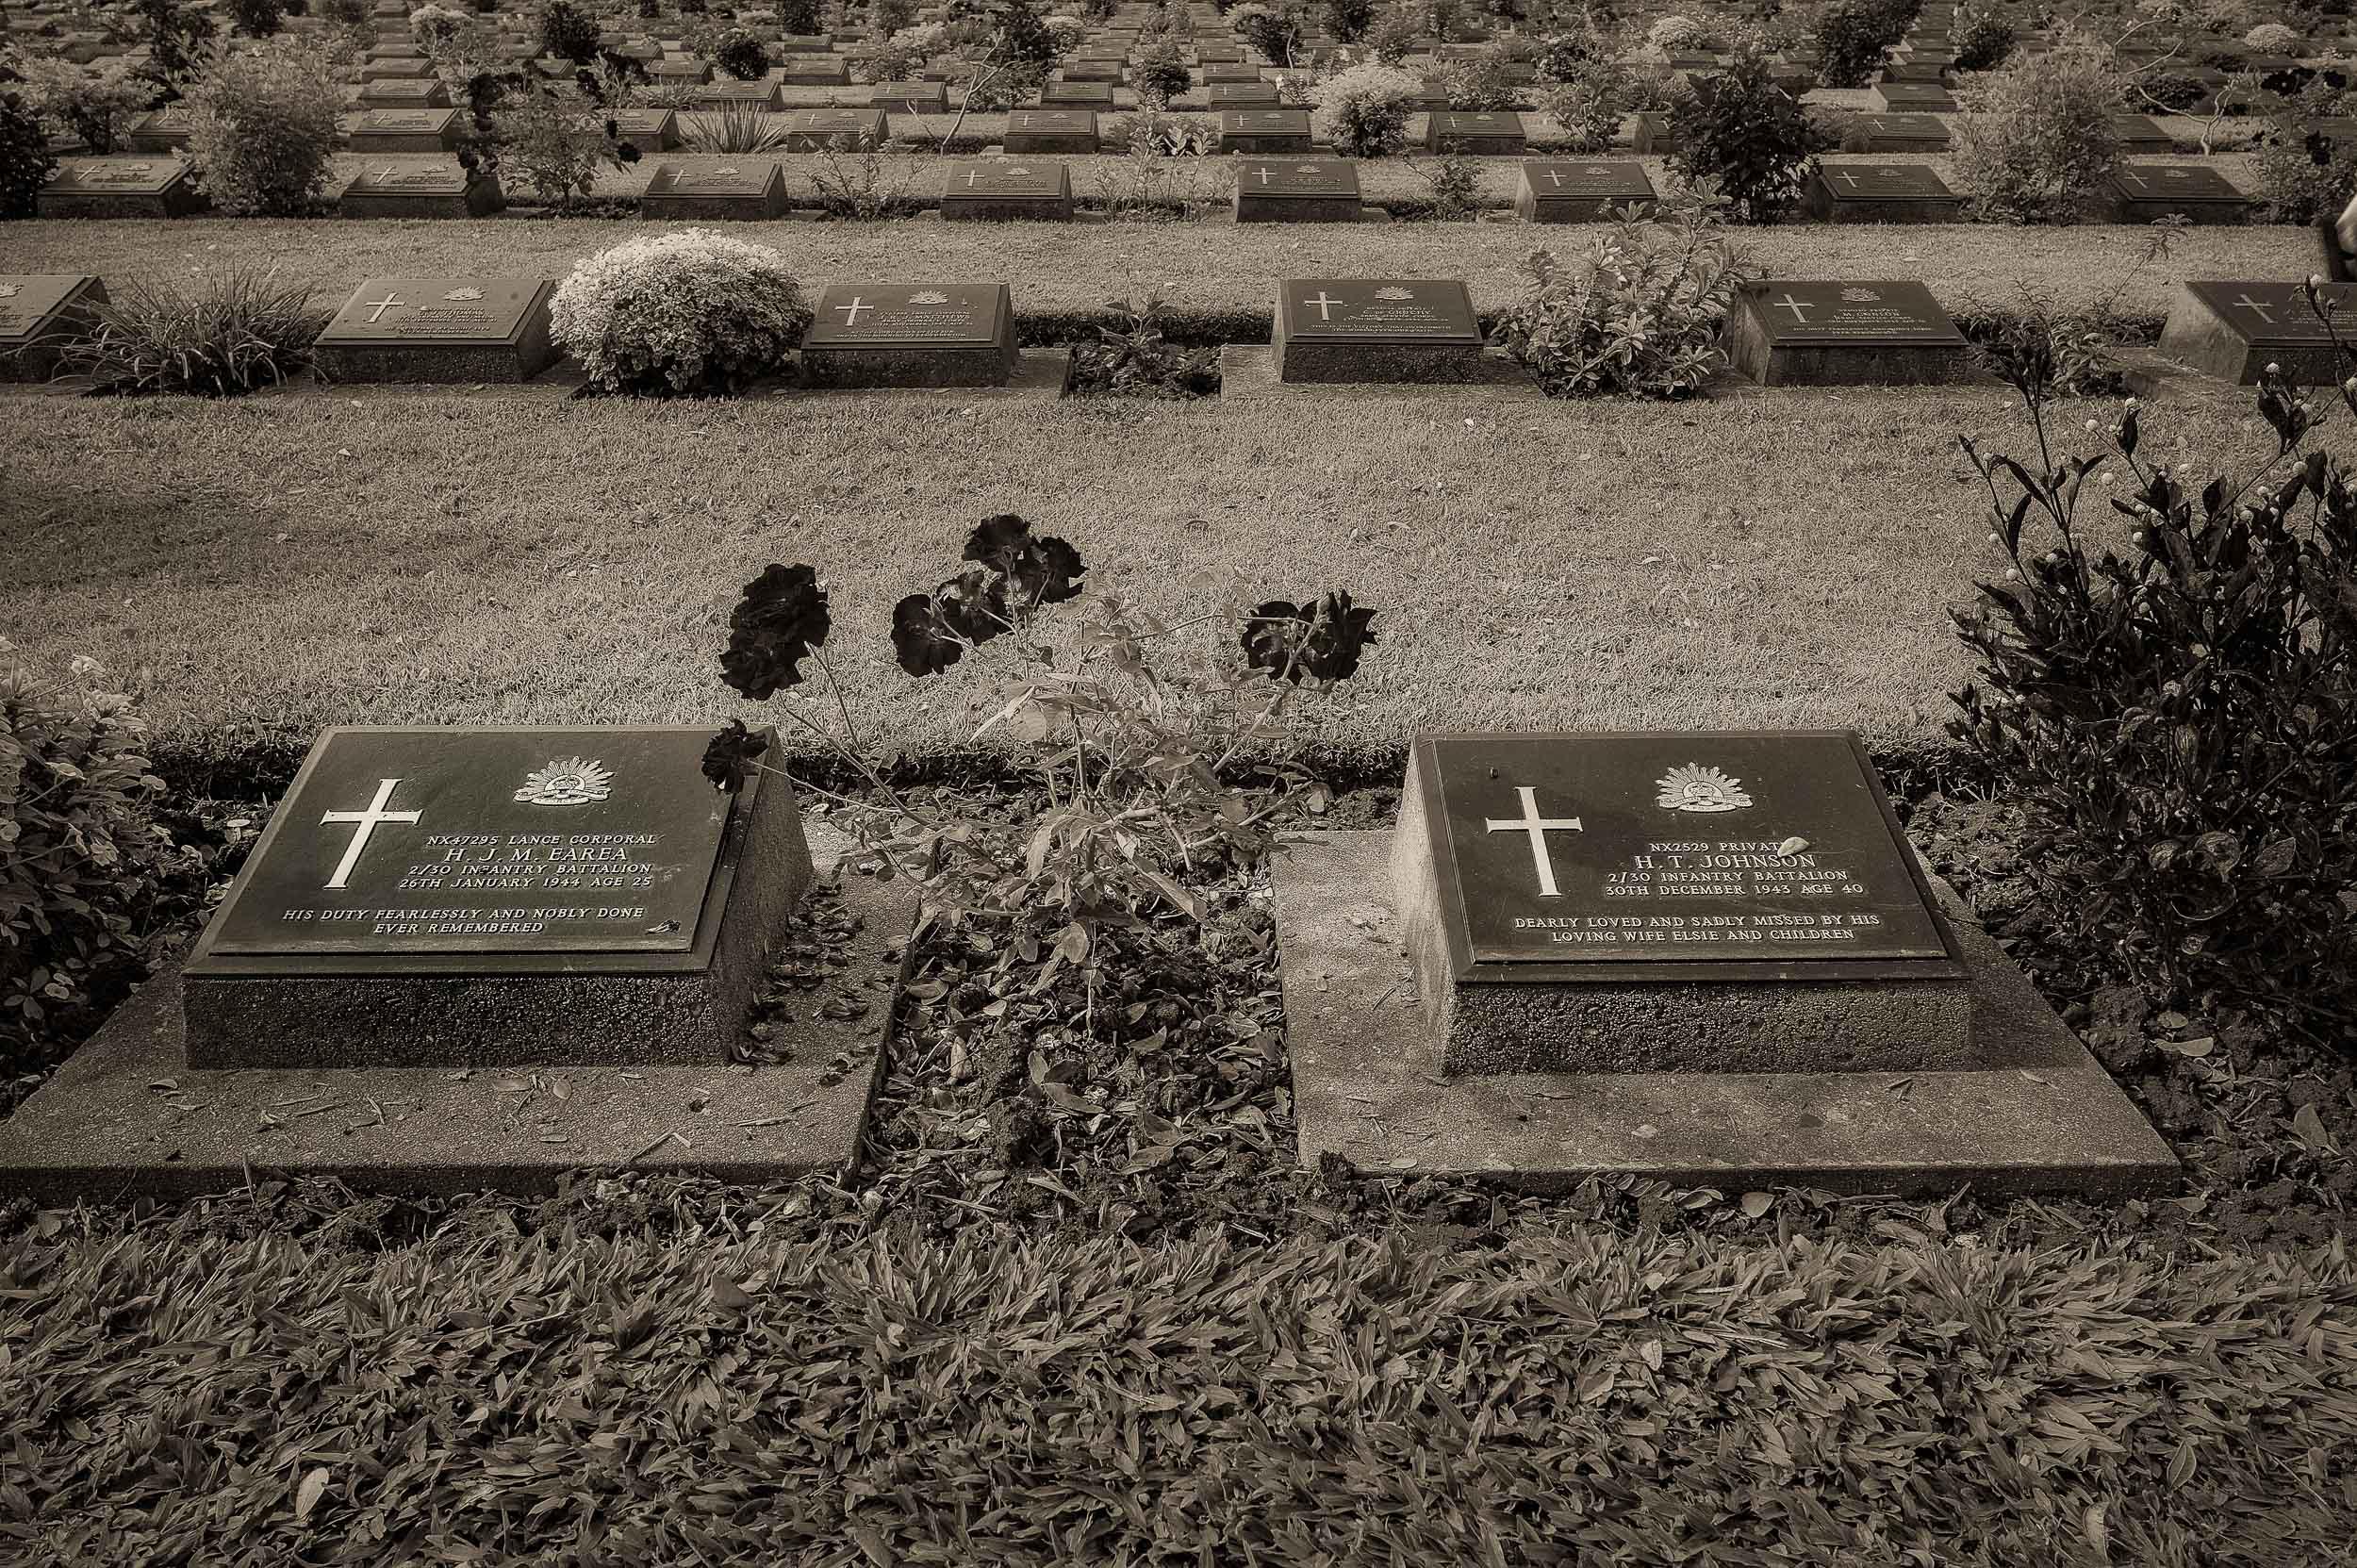 Grave stones  at the beautifully maintained  Kanchanaburi War Cemetery  in the town of Kanchanaburi,  Thailand .